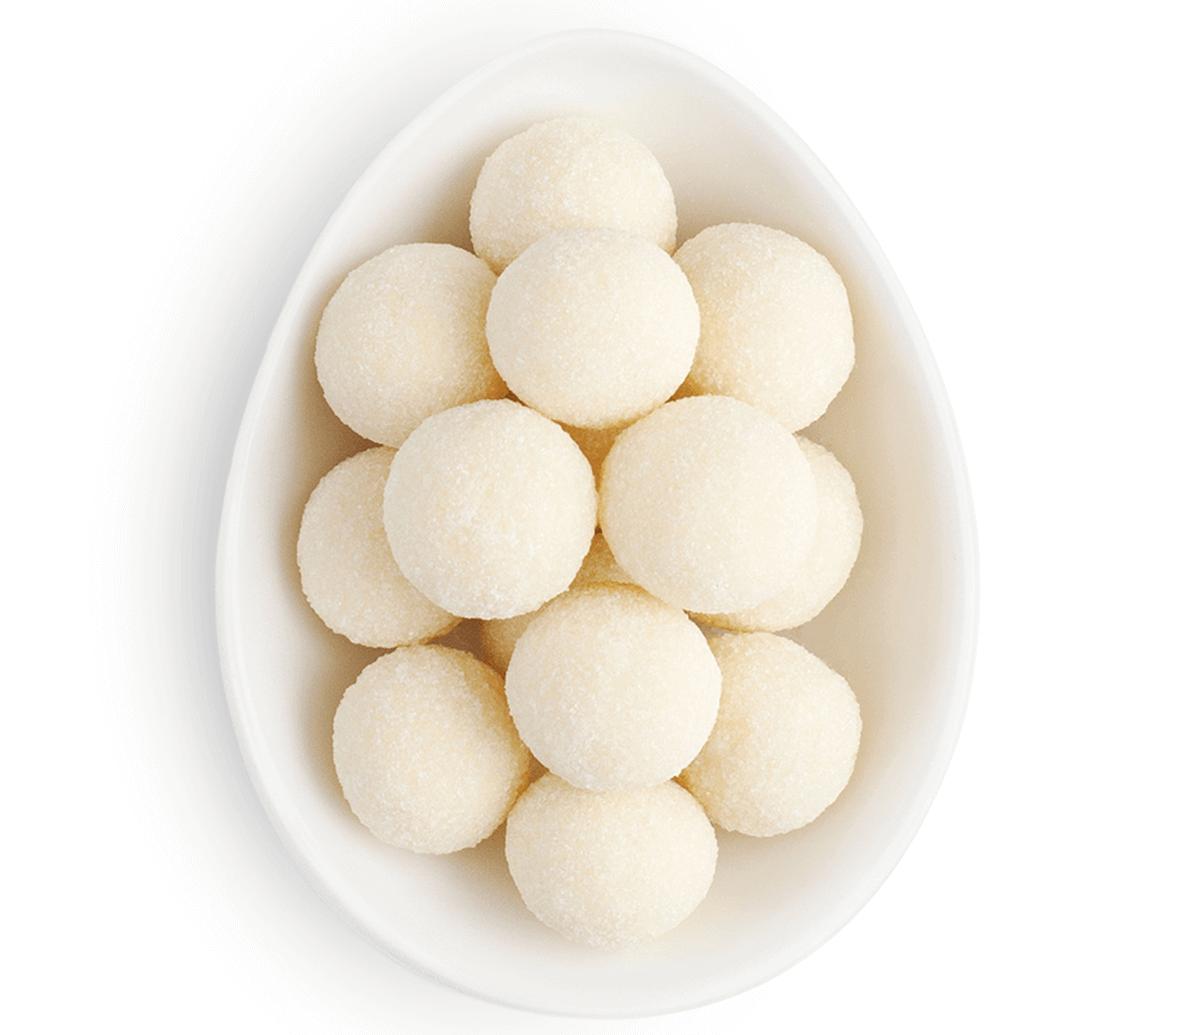 Sugarfina Sugar Cookies